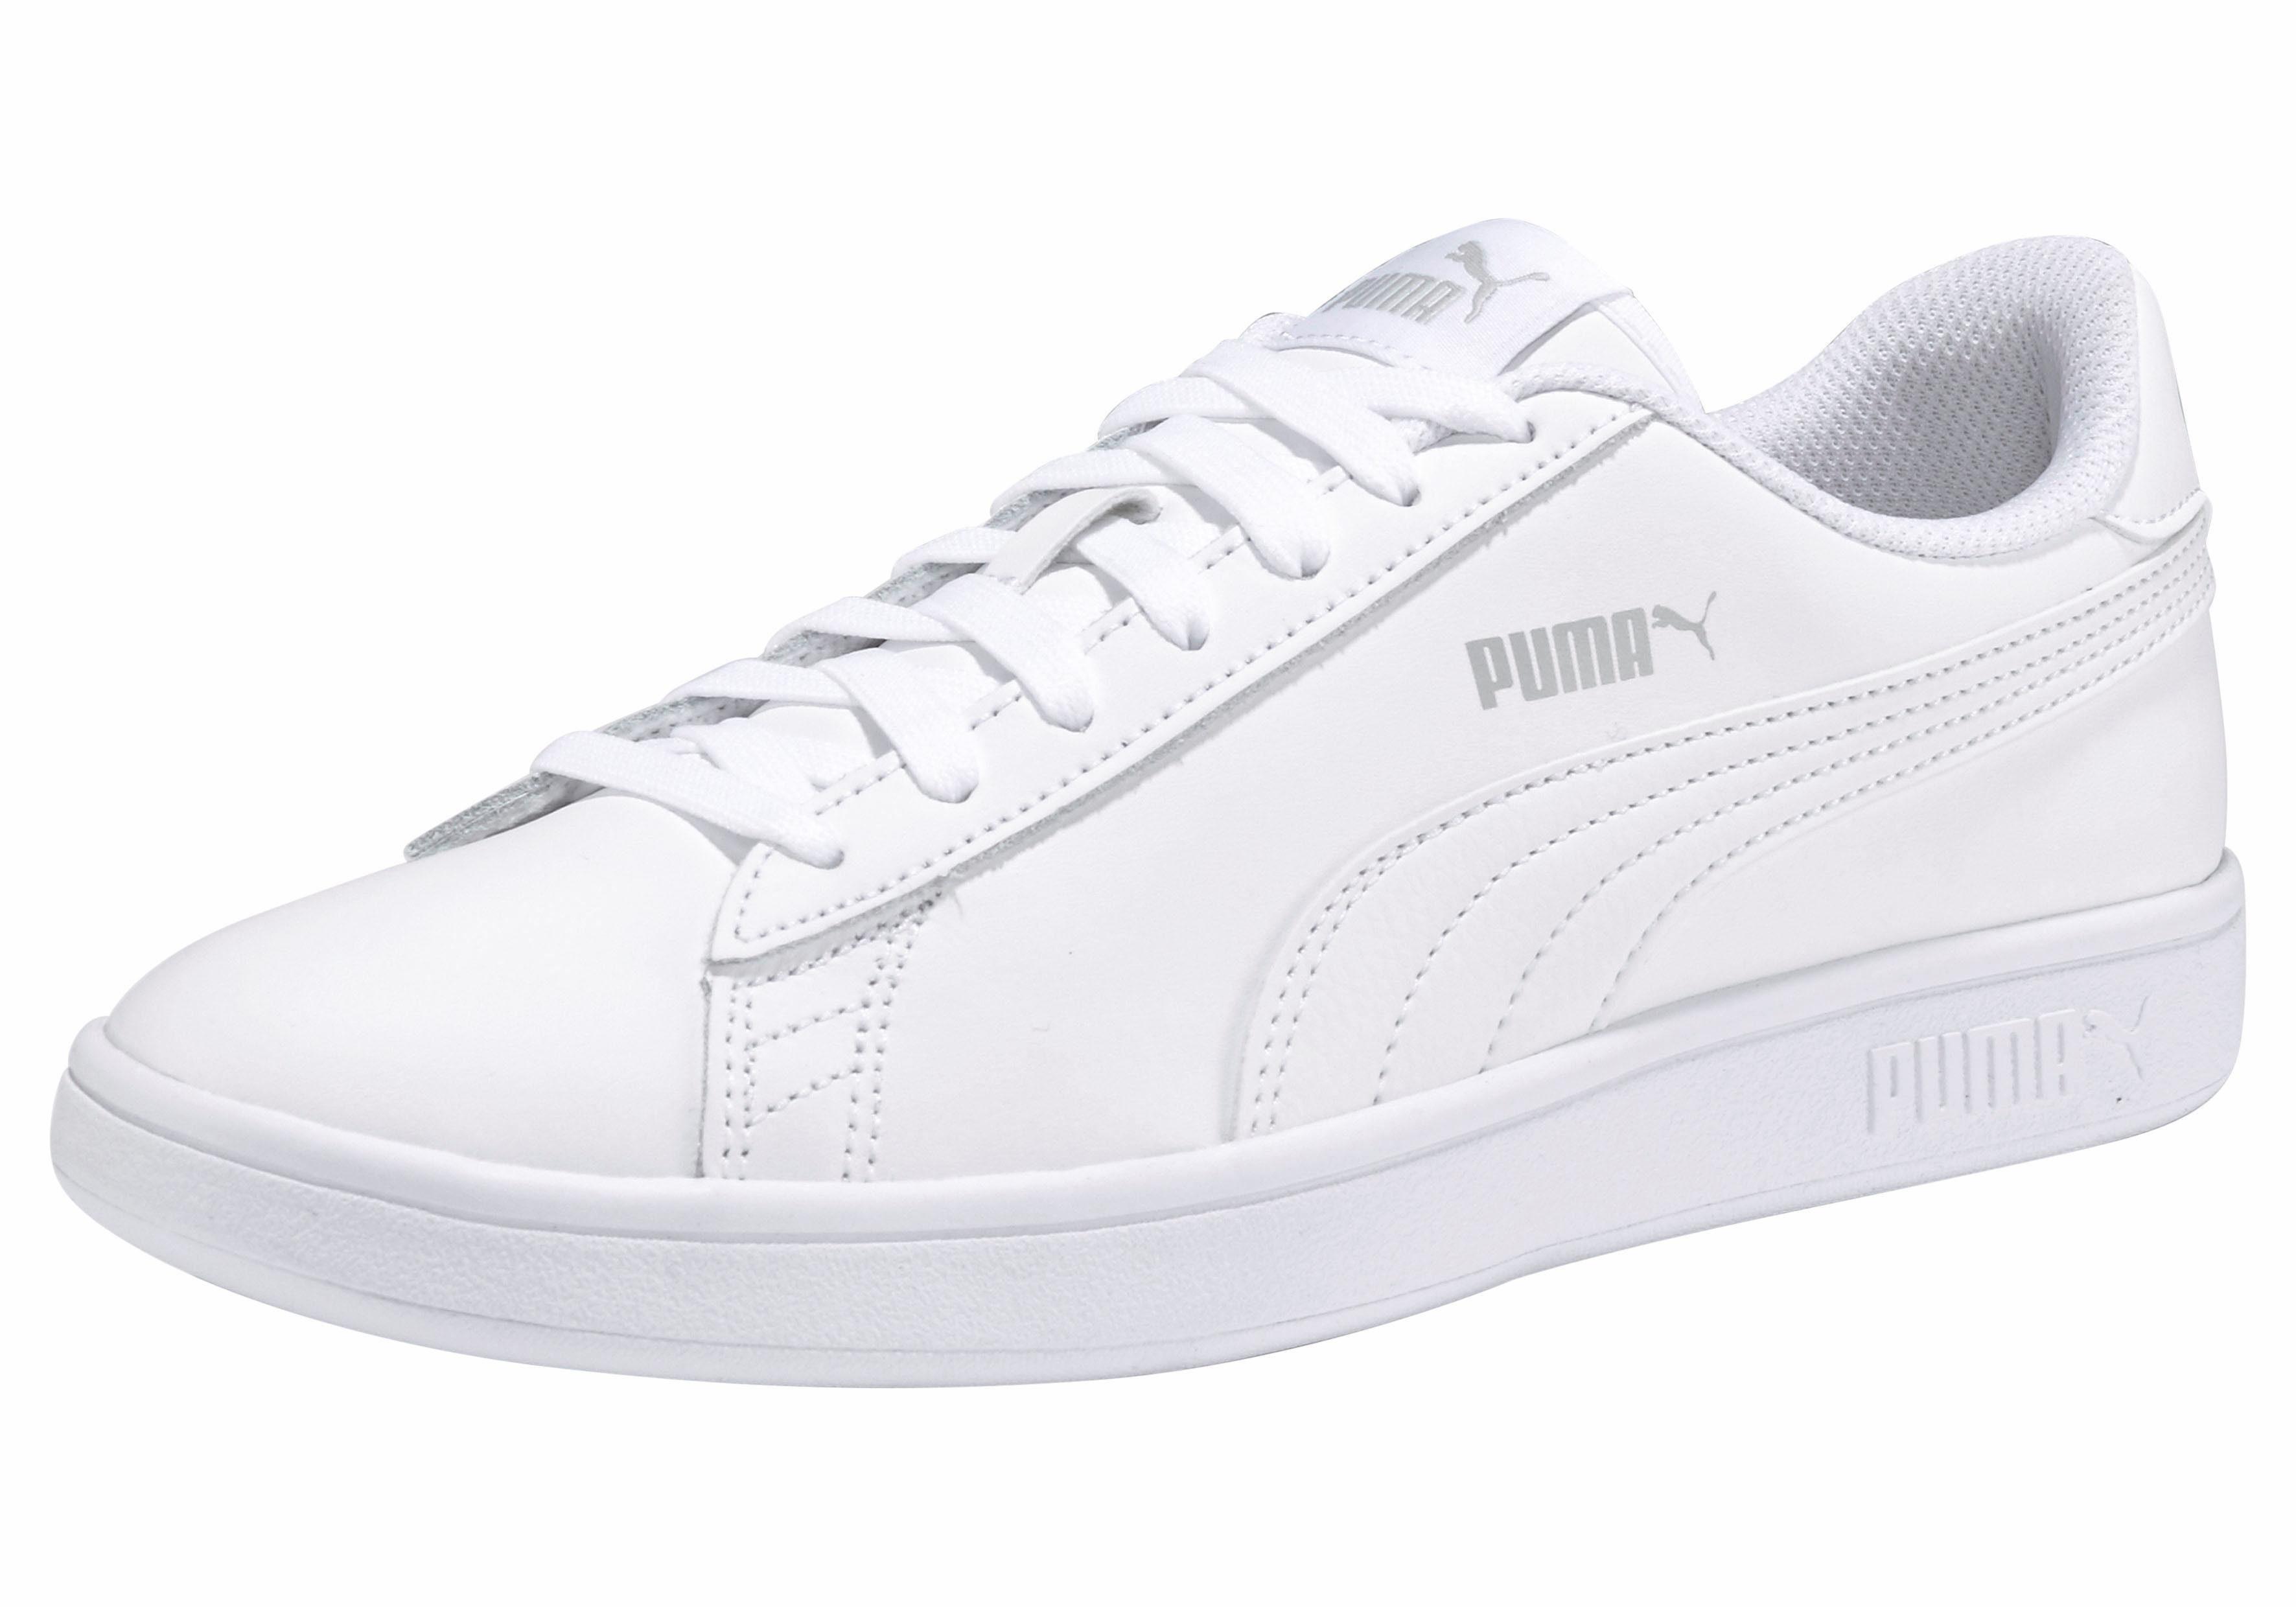 PUMA »Puma Smash Wns v2 L« Sneaker, Klassischer Sneaker von